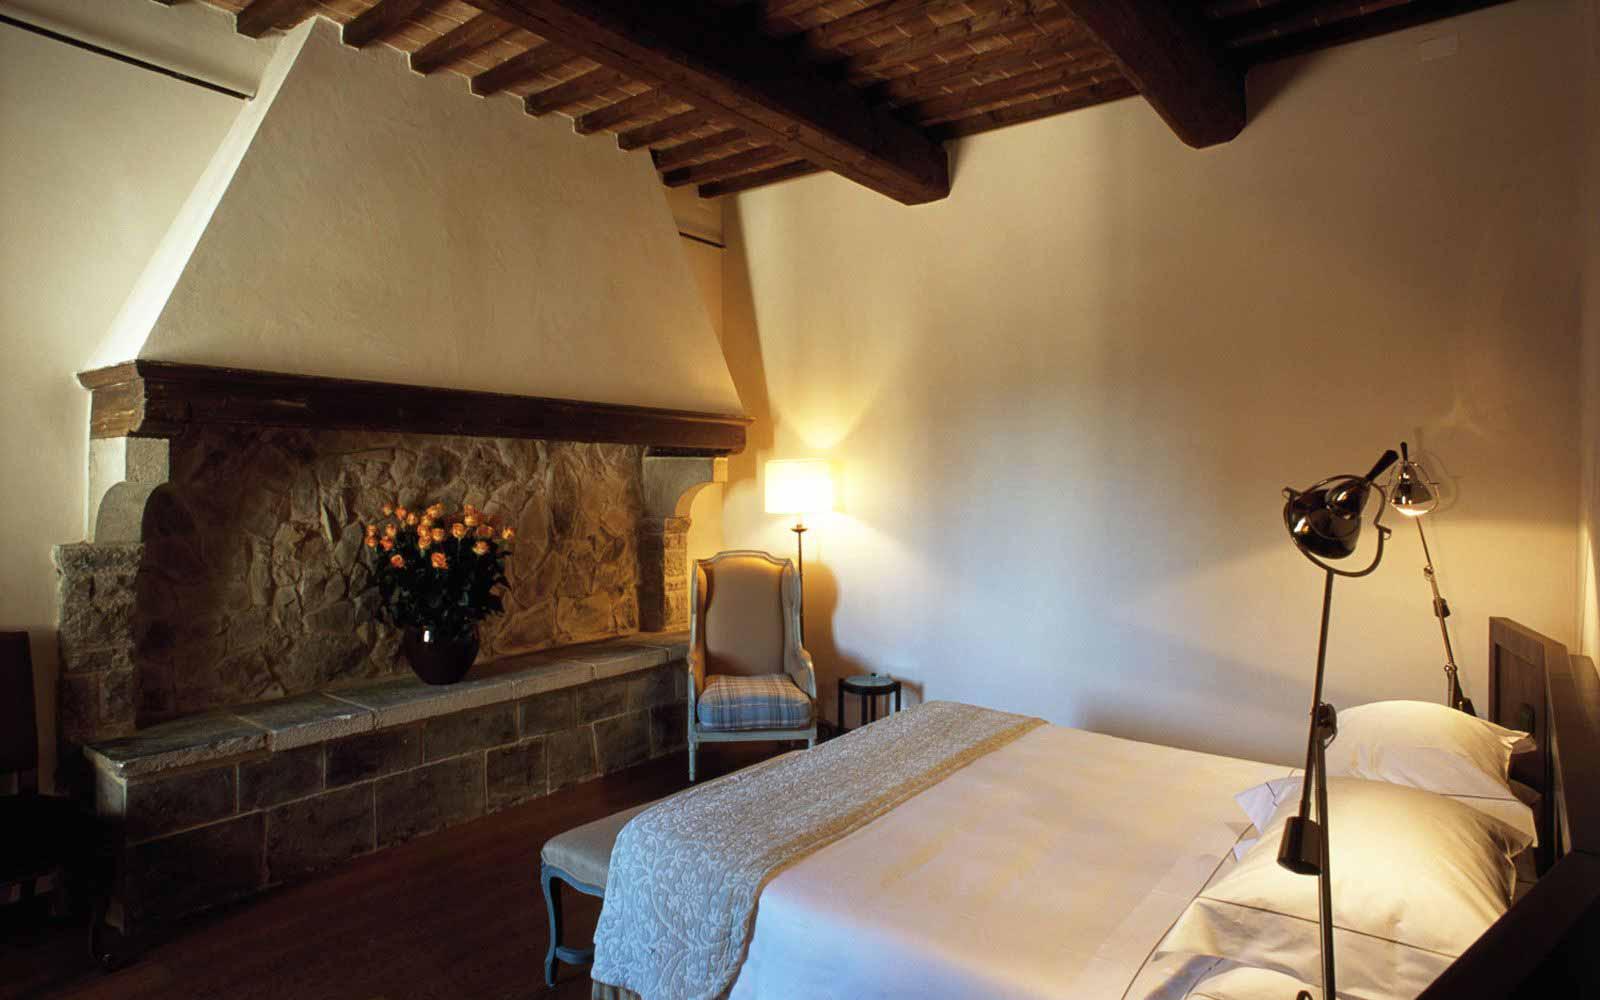 Executive Suite at Castel Monastero Tuscan Resort & Spa